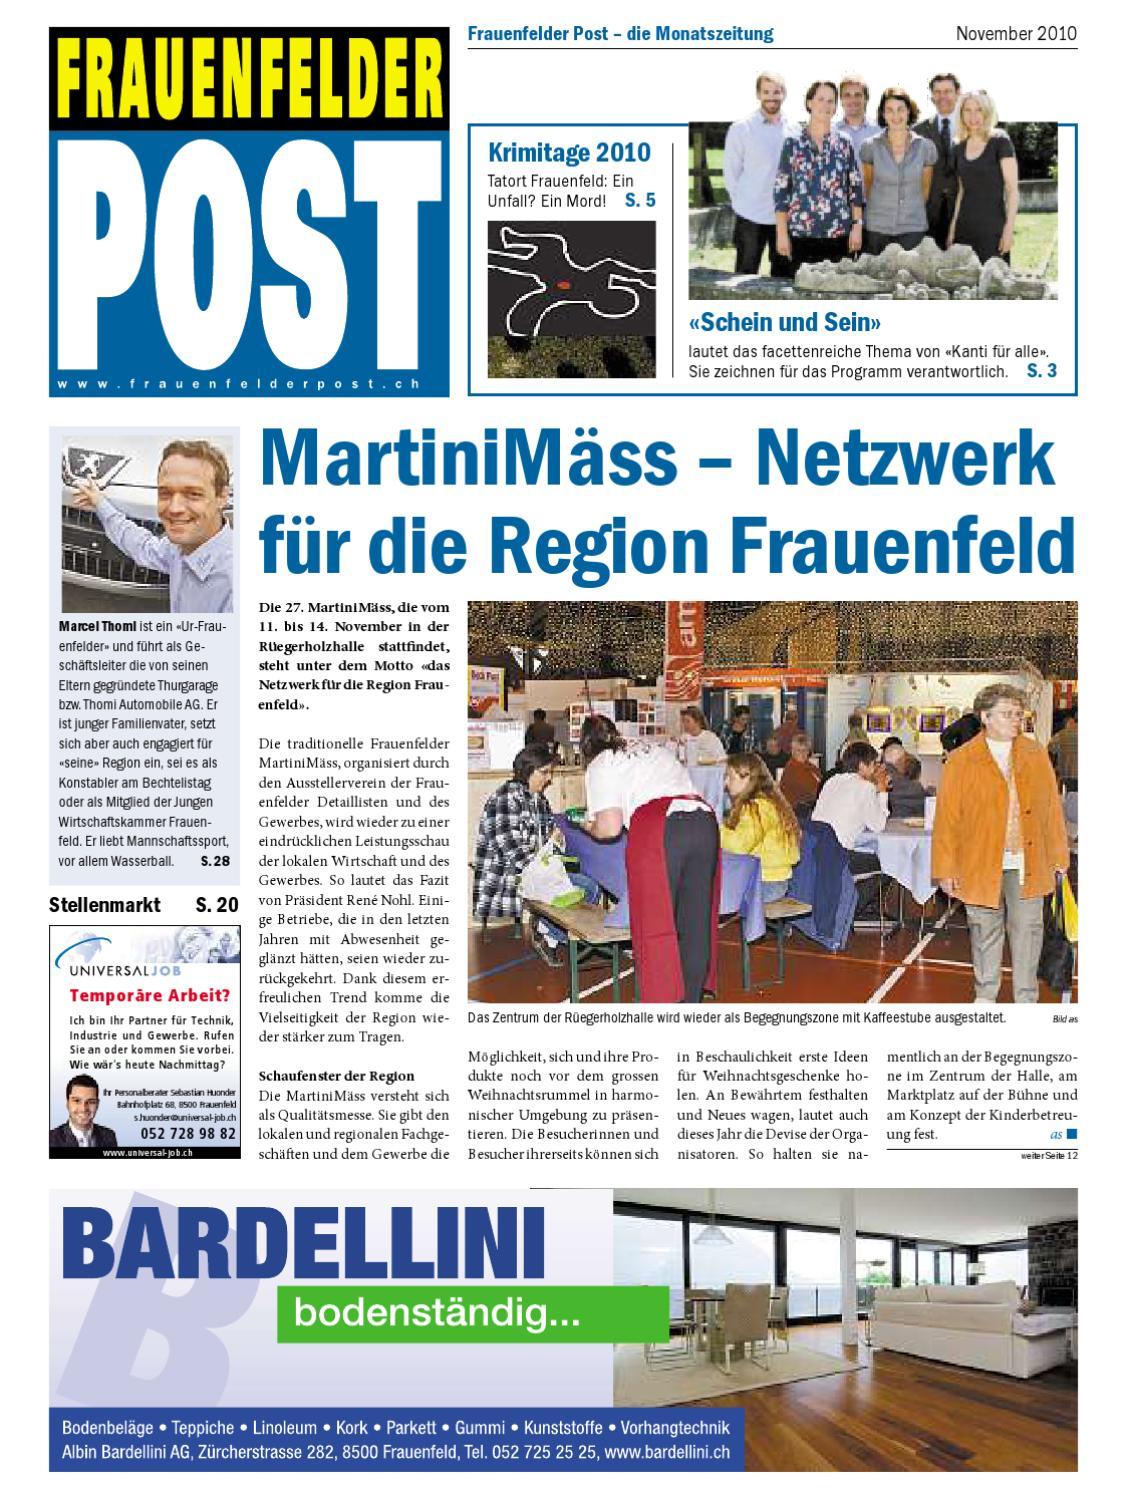 Frauenfelder Post - November 2010 By «Post»Medien - Issuu